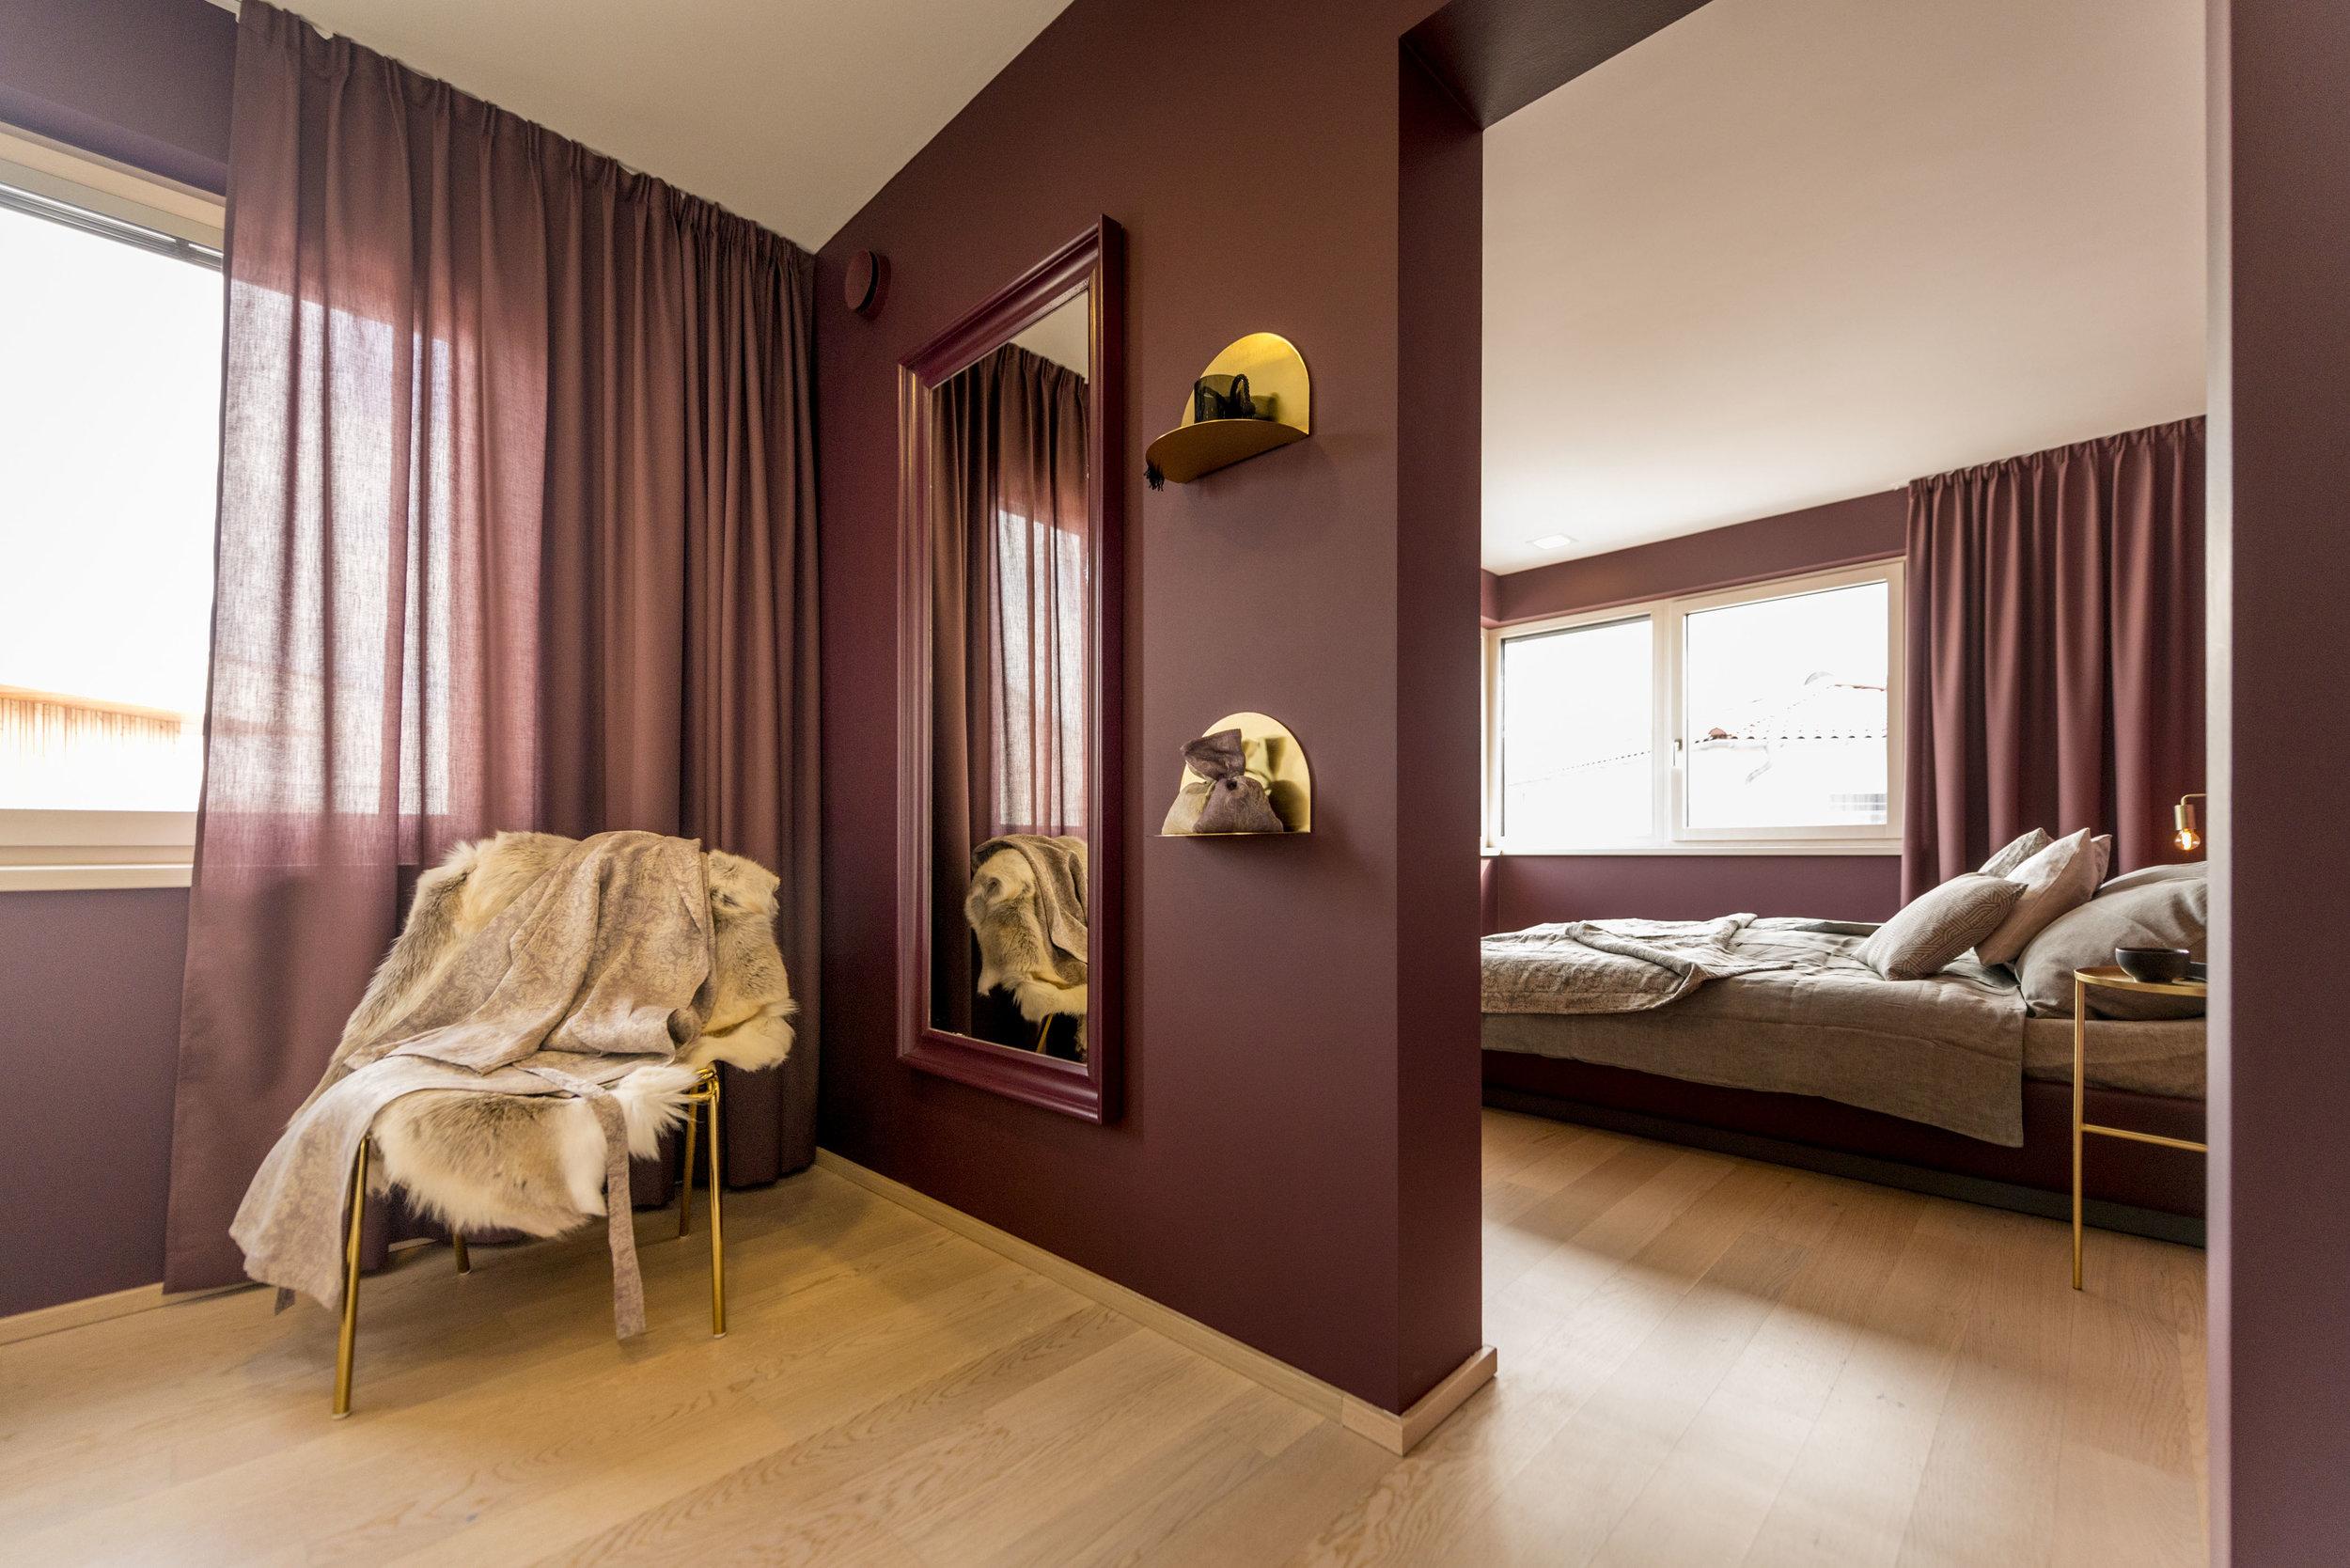 Fridi_Nefe-Kampa-Haus_092.jpg